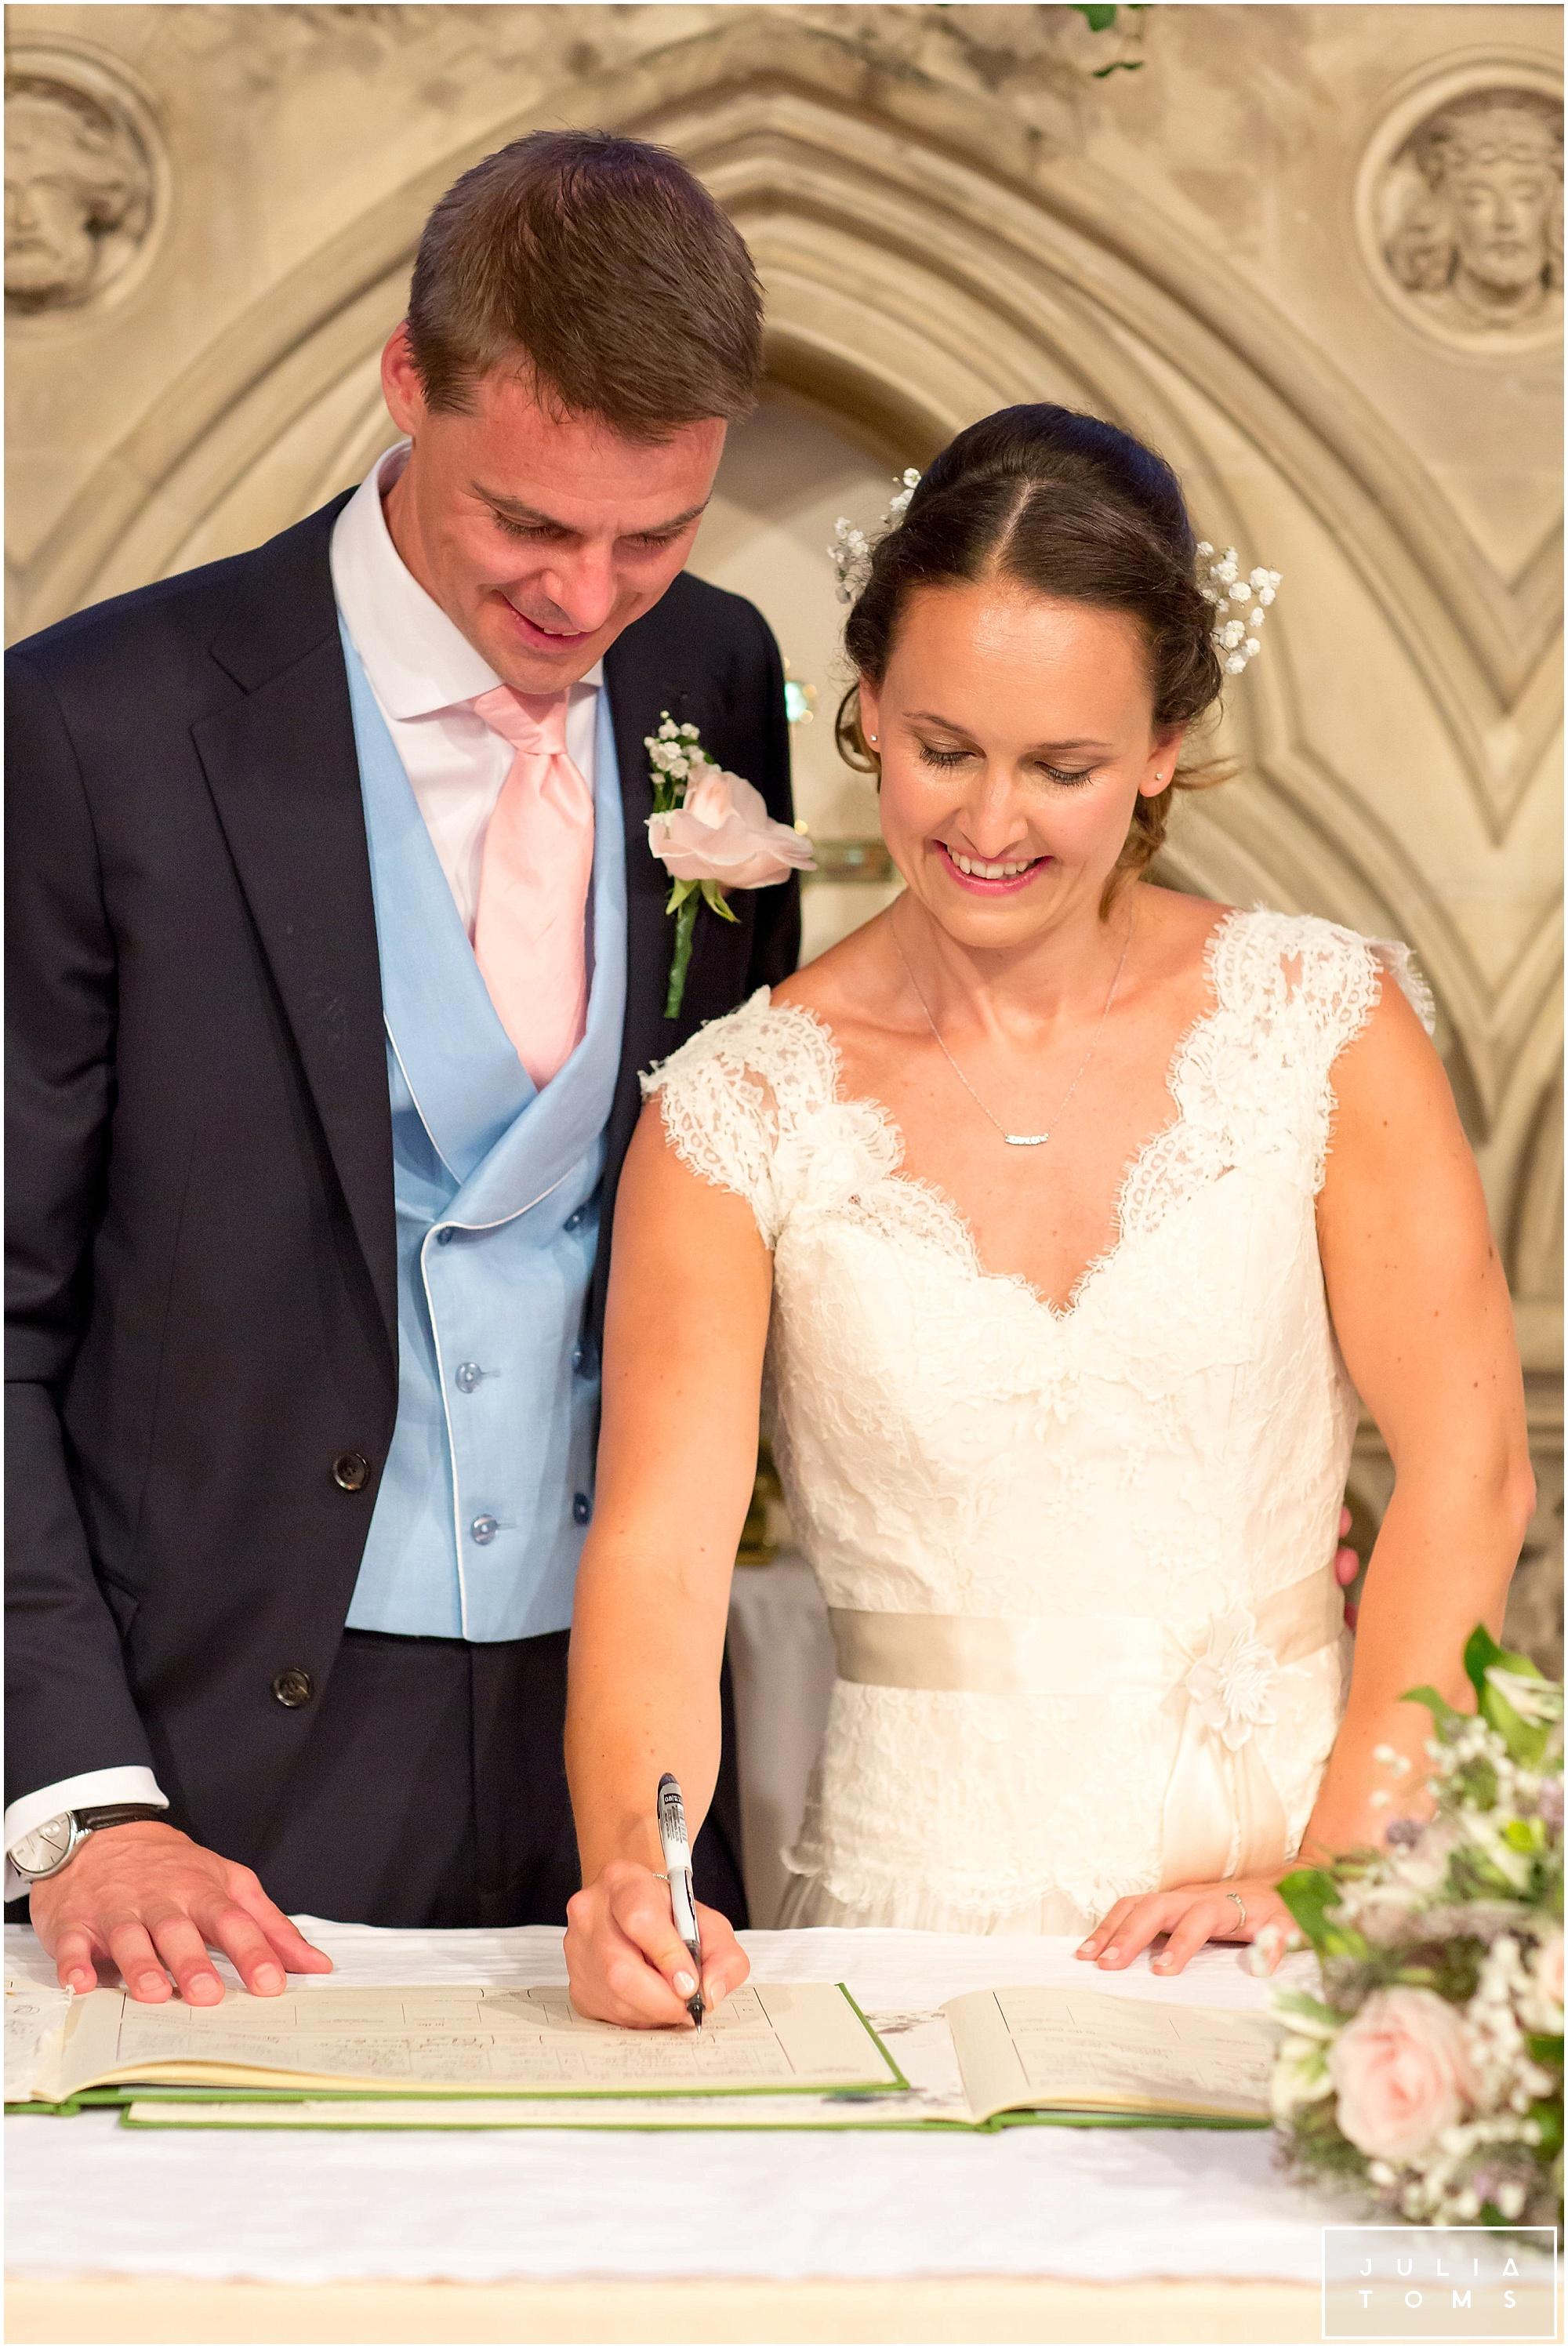 julia_toms_chichester_wedding_photographer_portsmouth_030.jpg